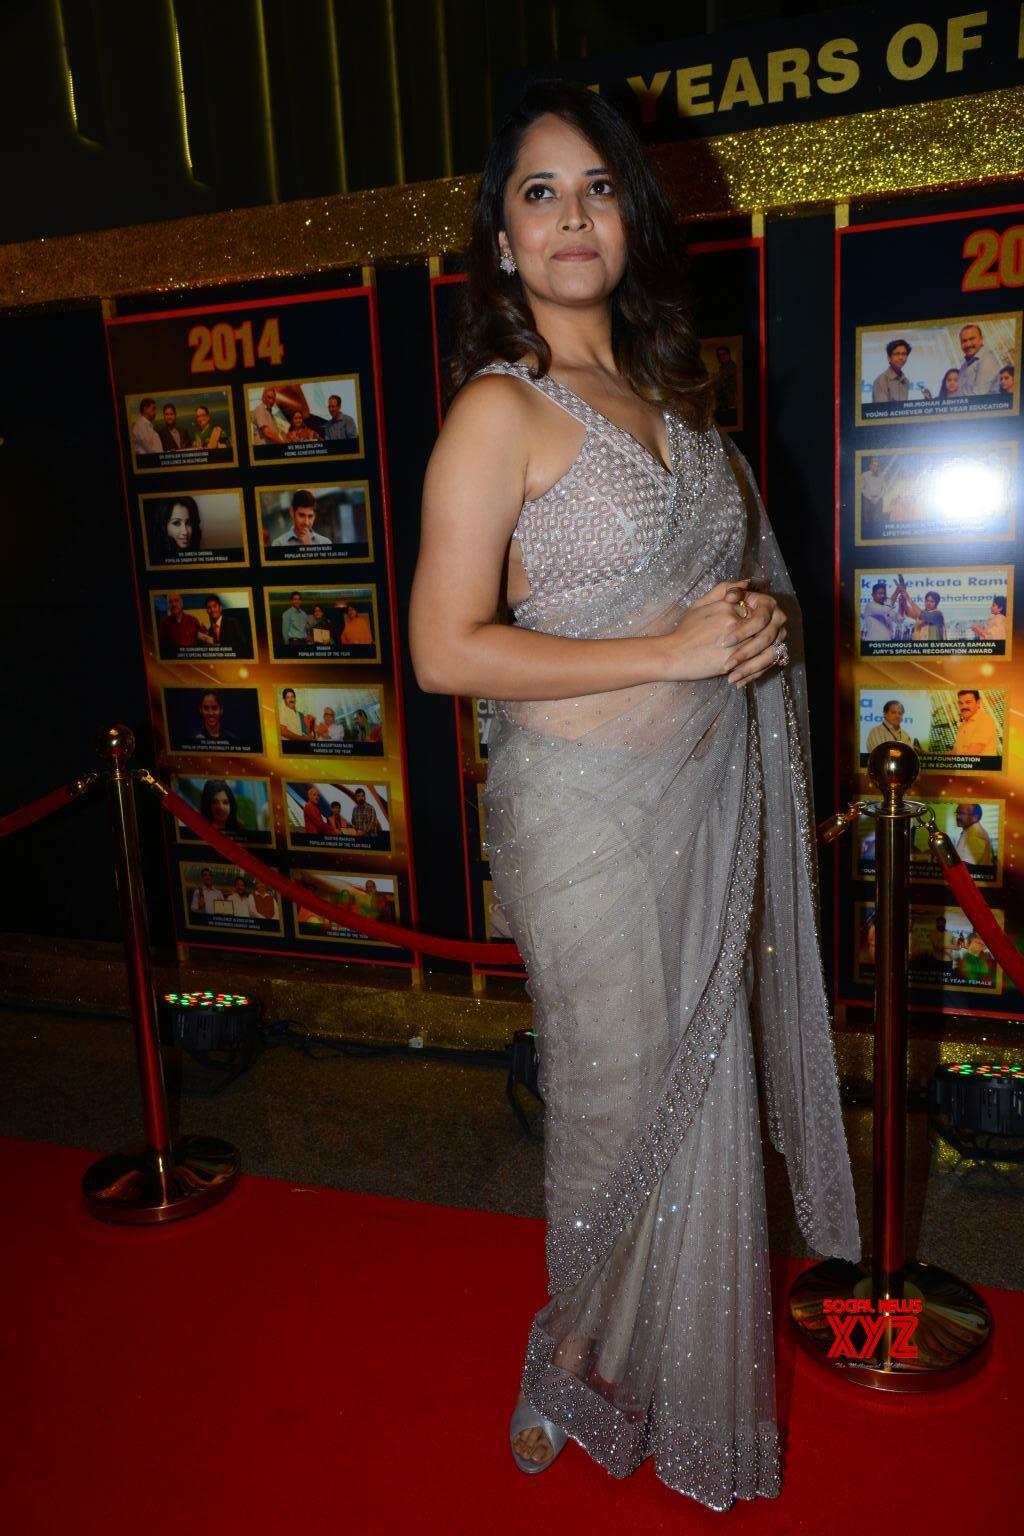 Actress Anasuya Bharadwaj Stills From Sakshi Excellence